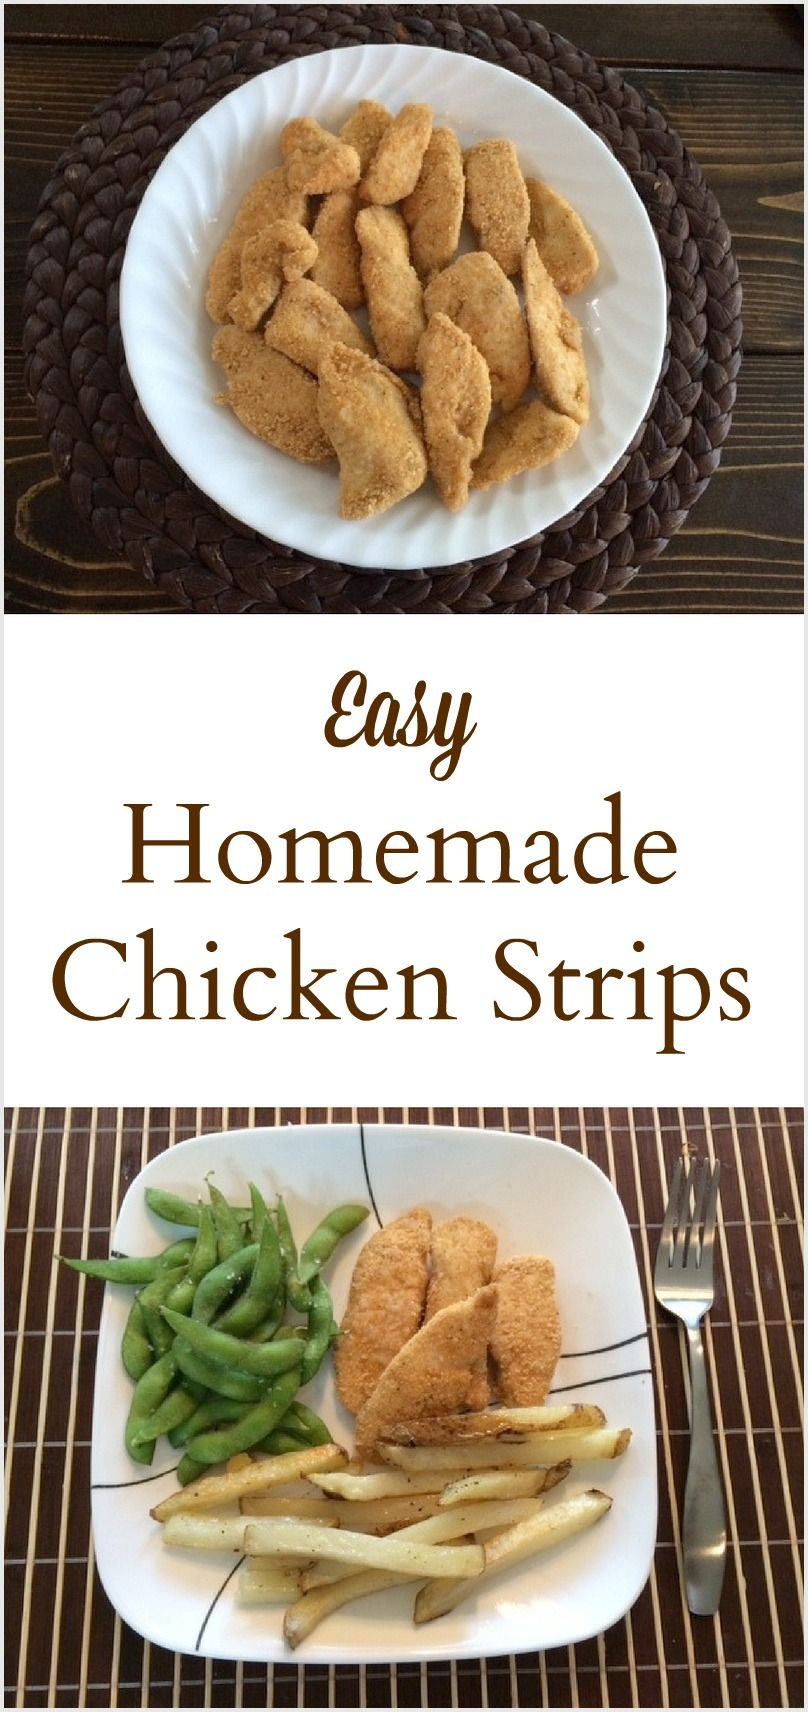 Easy healthy chicken recipes kid friendly